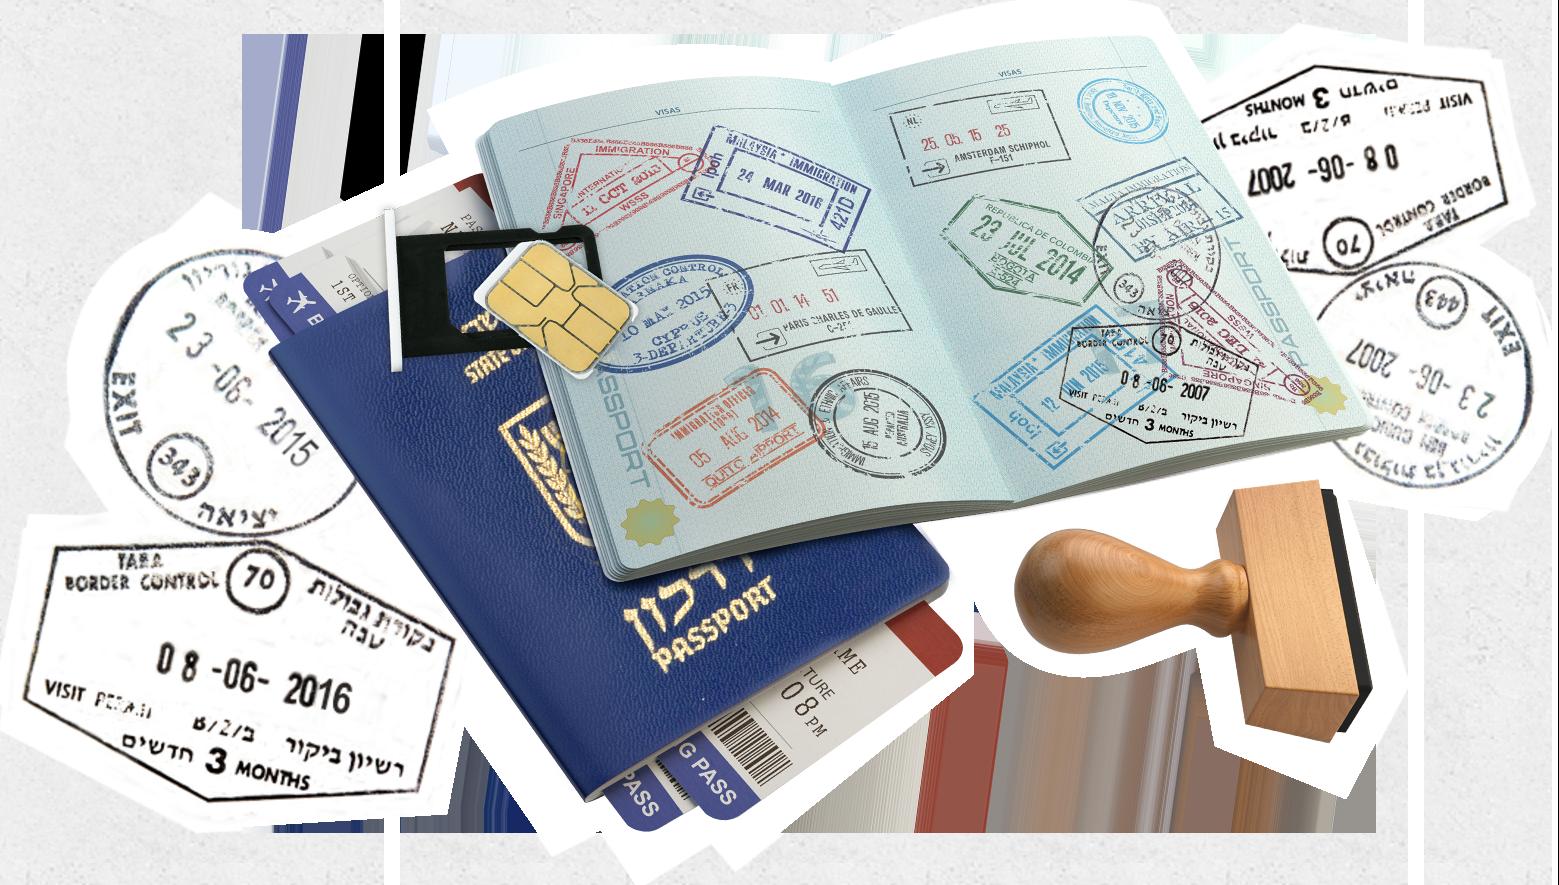 Passport-israeli